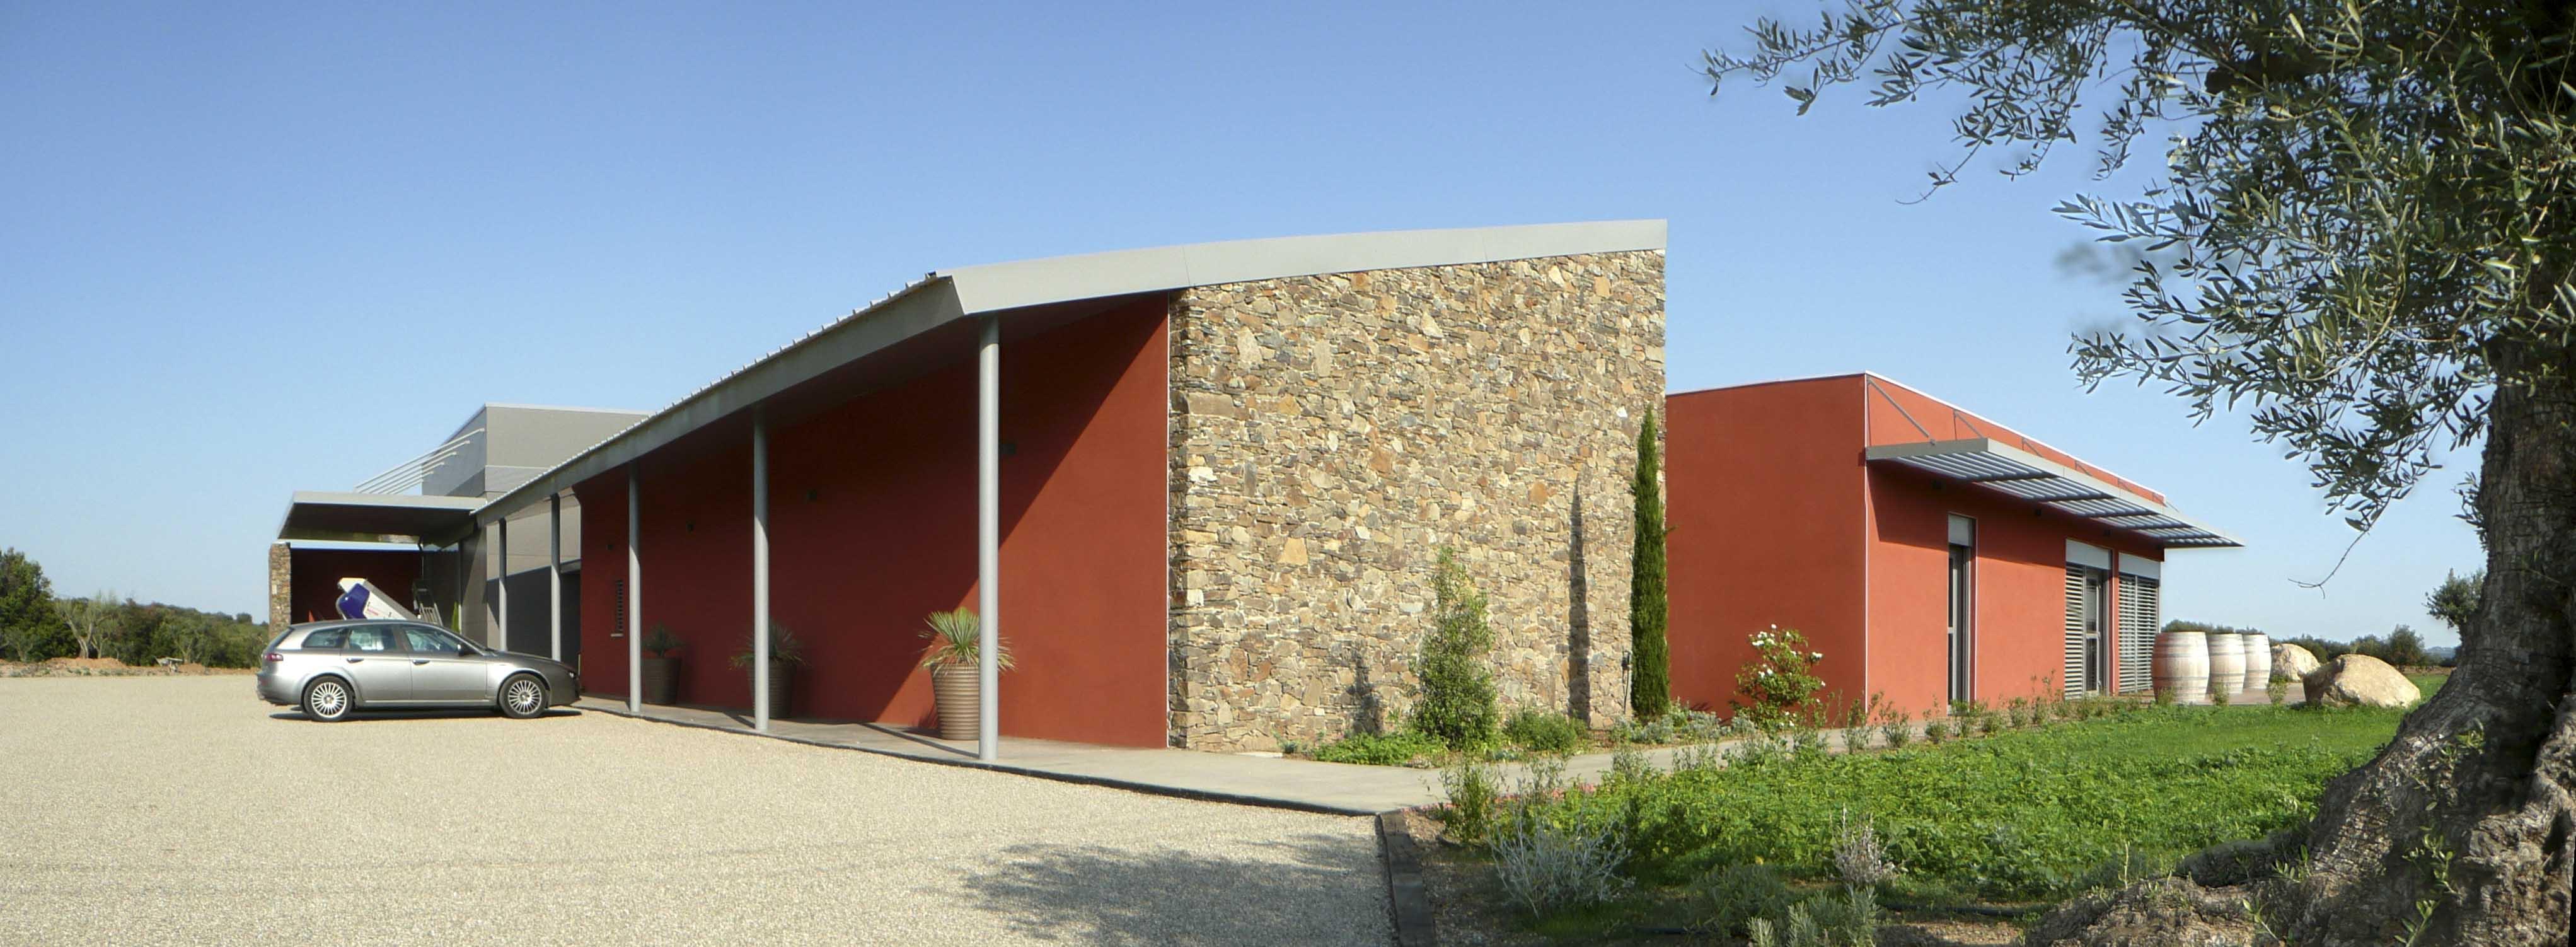 Mas Gabinele Hérault BF Architecture viticole 2